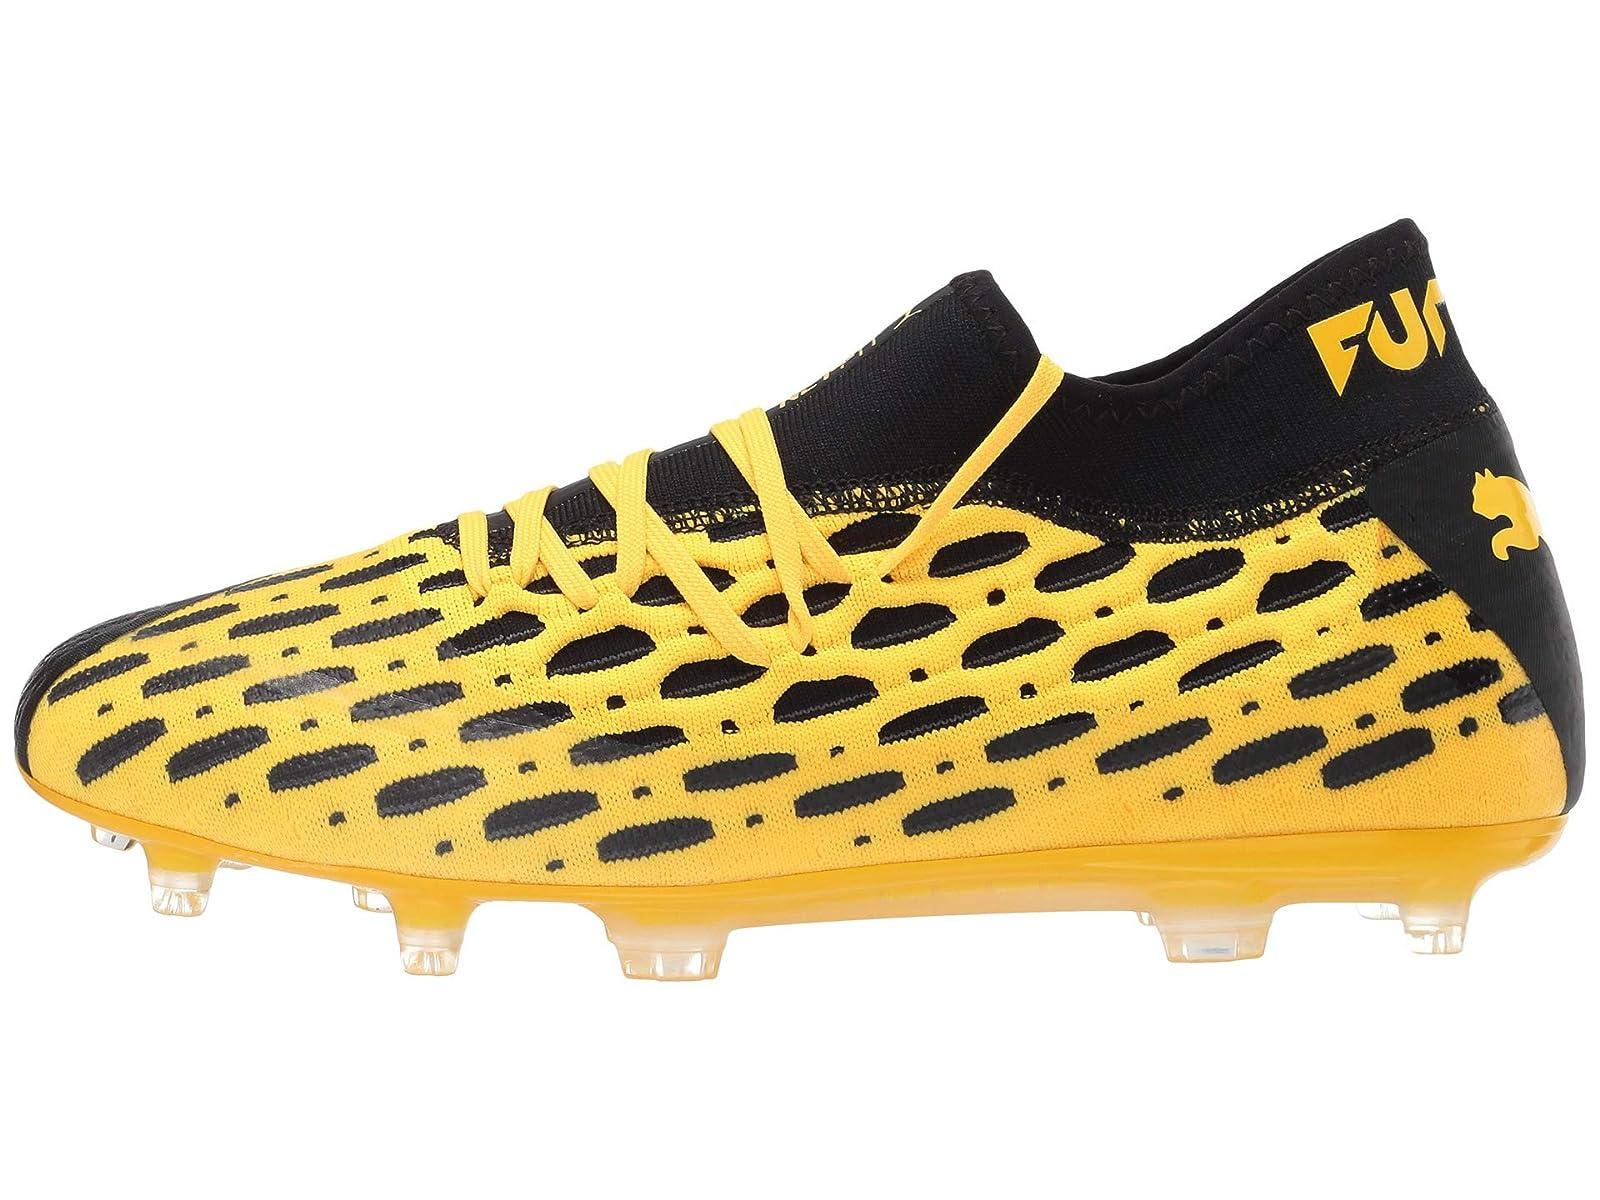 Man-039-s-Sneakers-amp-Athletic-Shoes-PUMA-Future-5-2-Netfit-FG-AG thumbnail 19